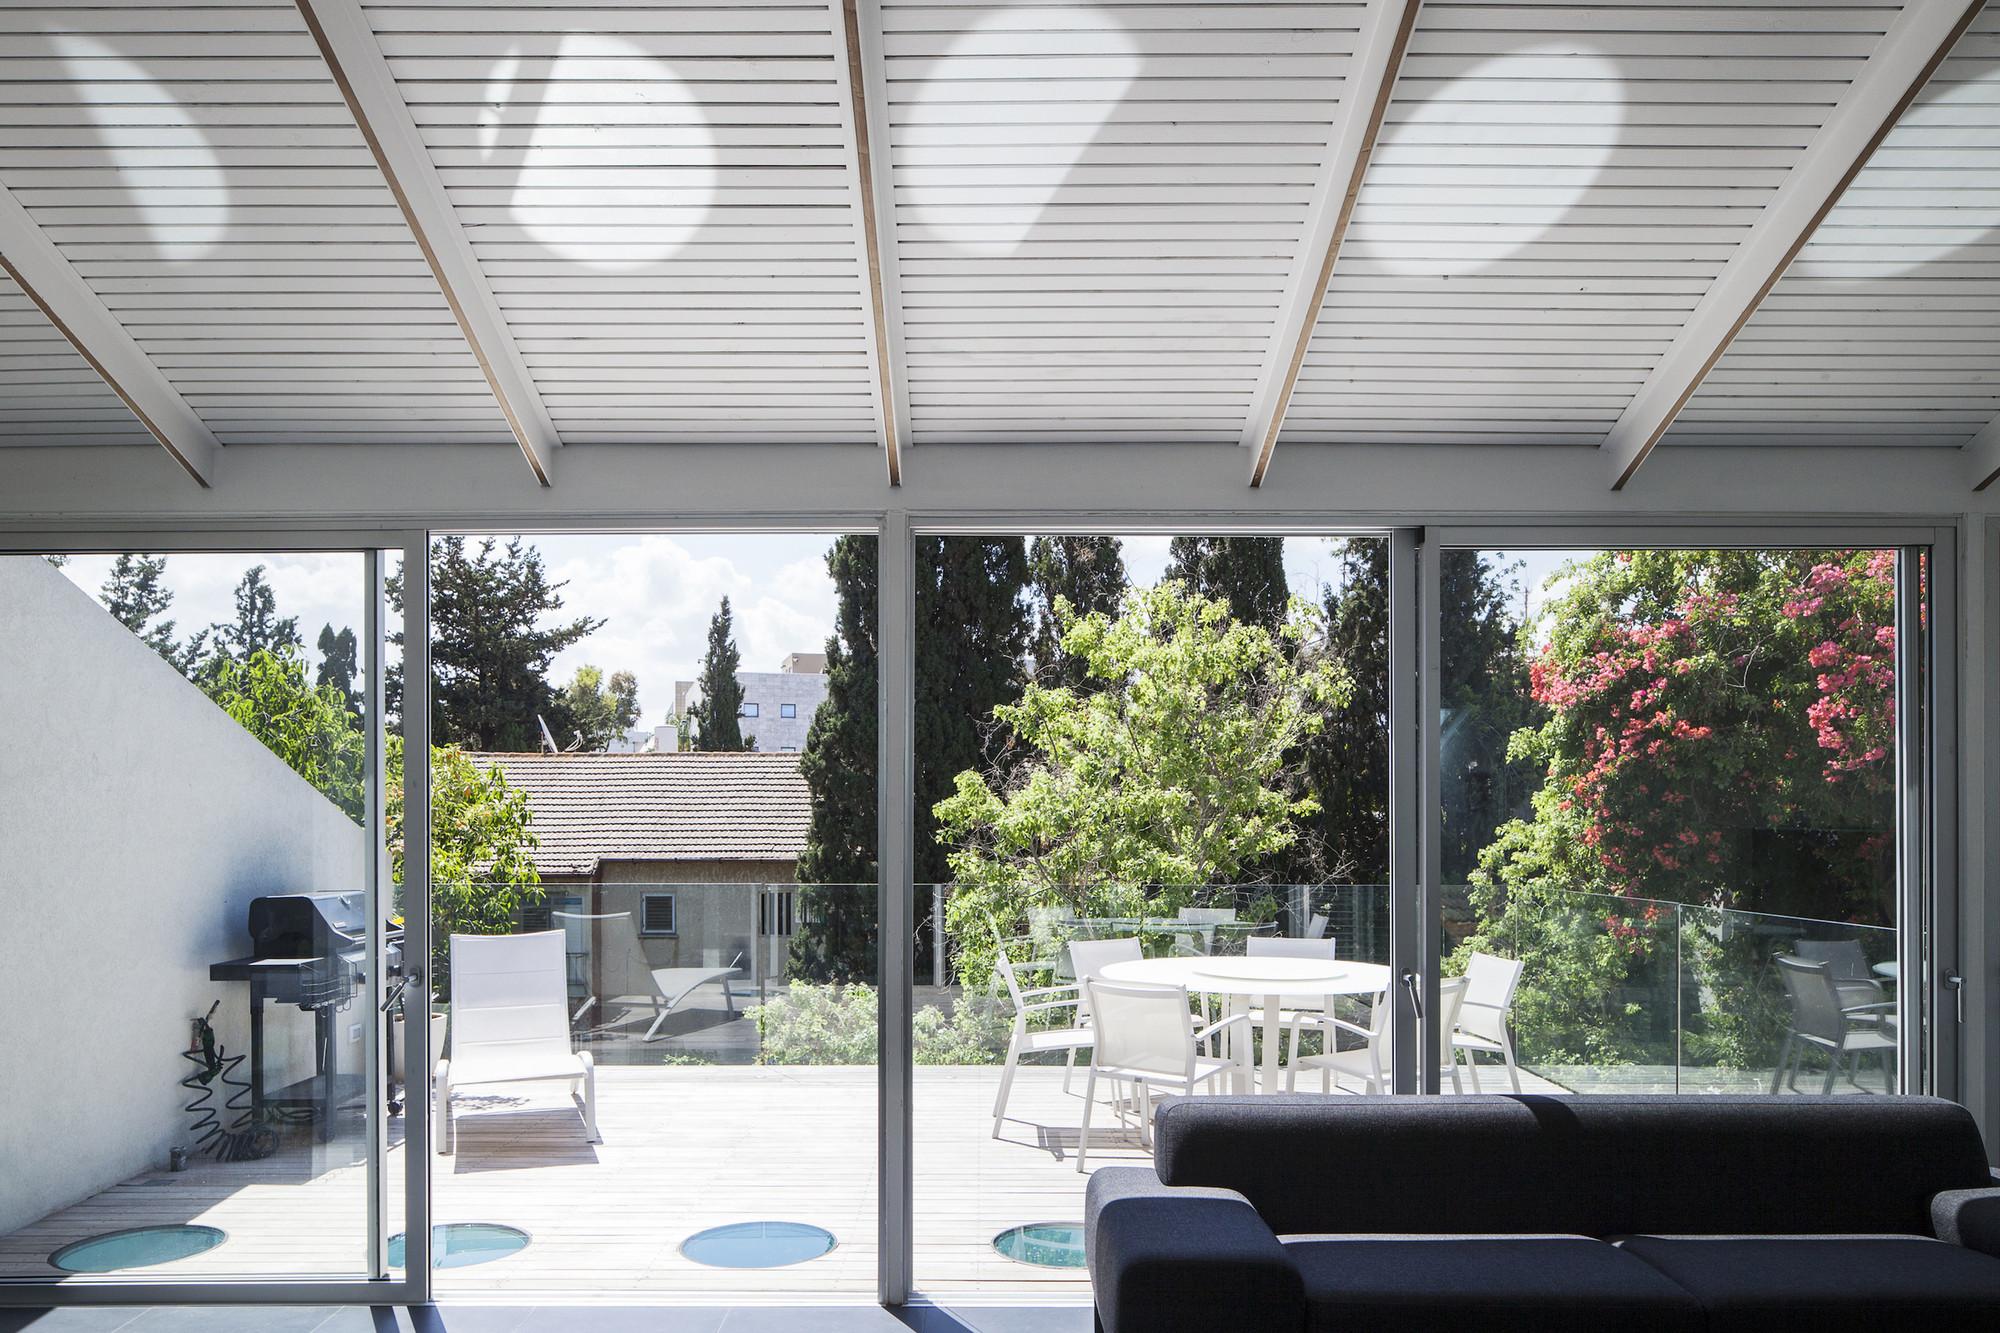 K-house / Arbejazz Architecture Studio